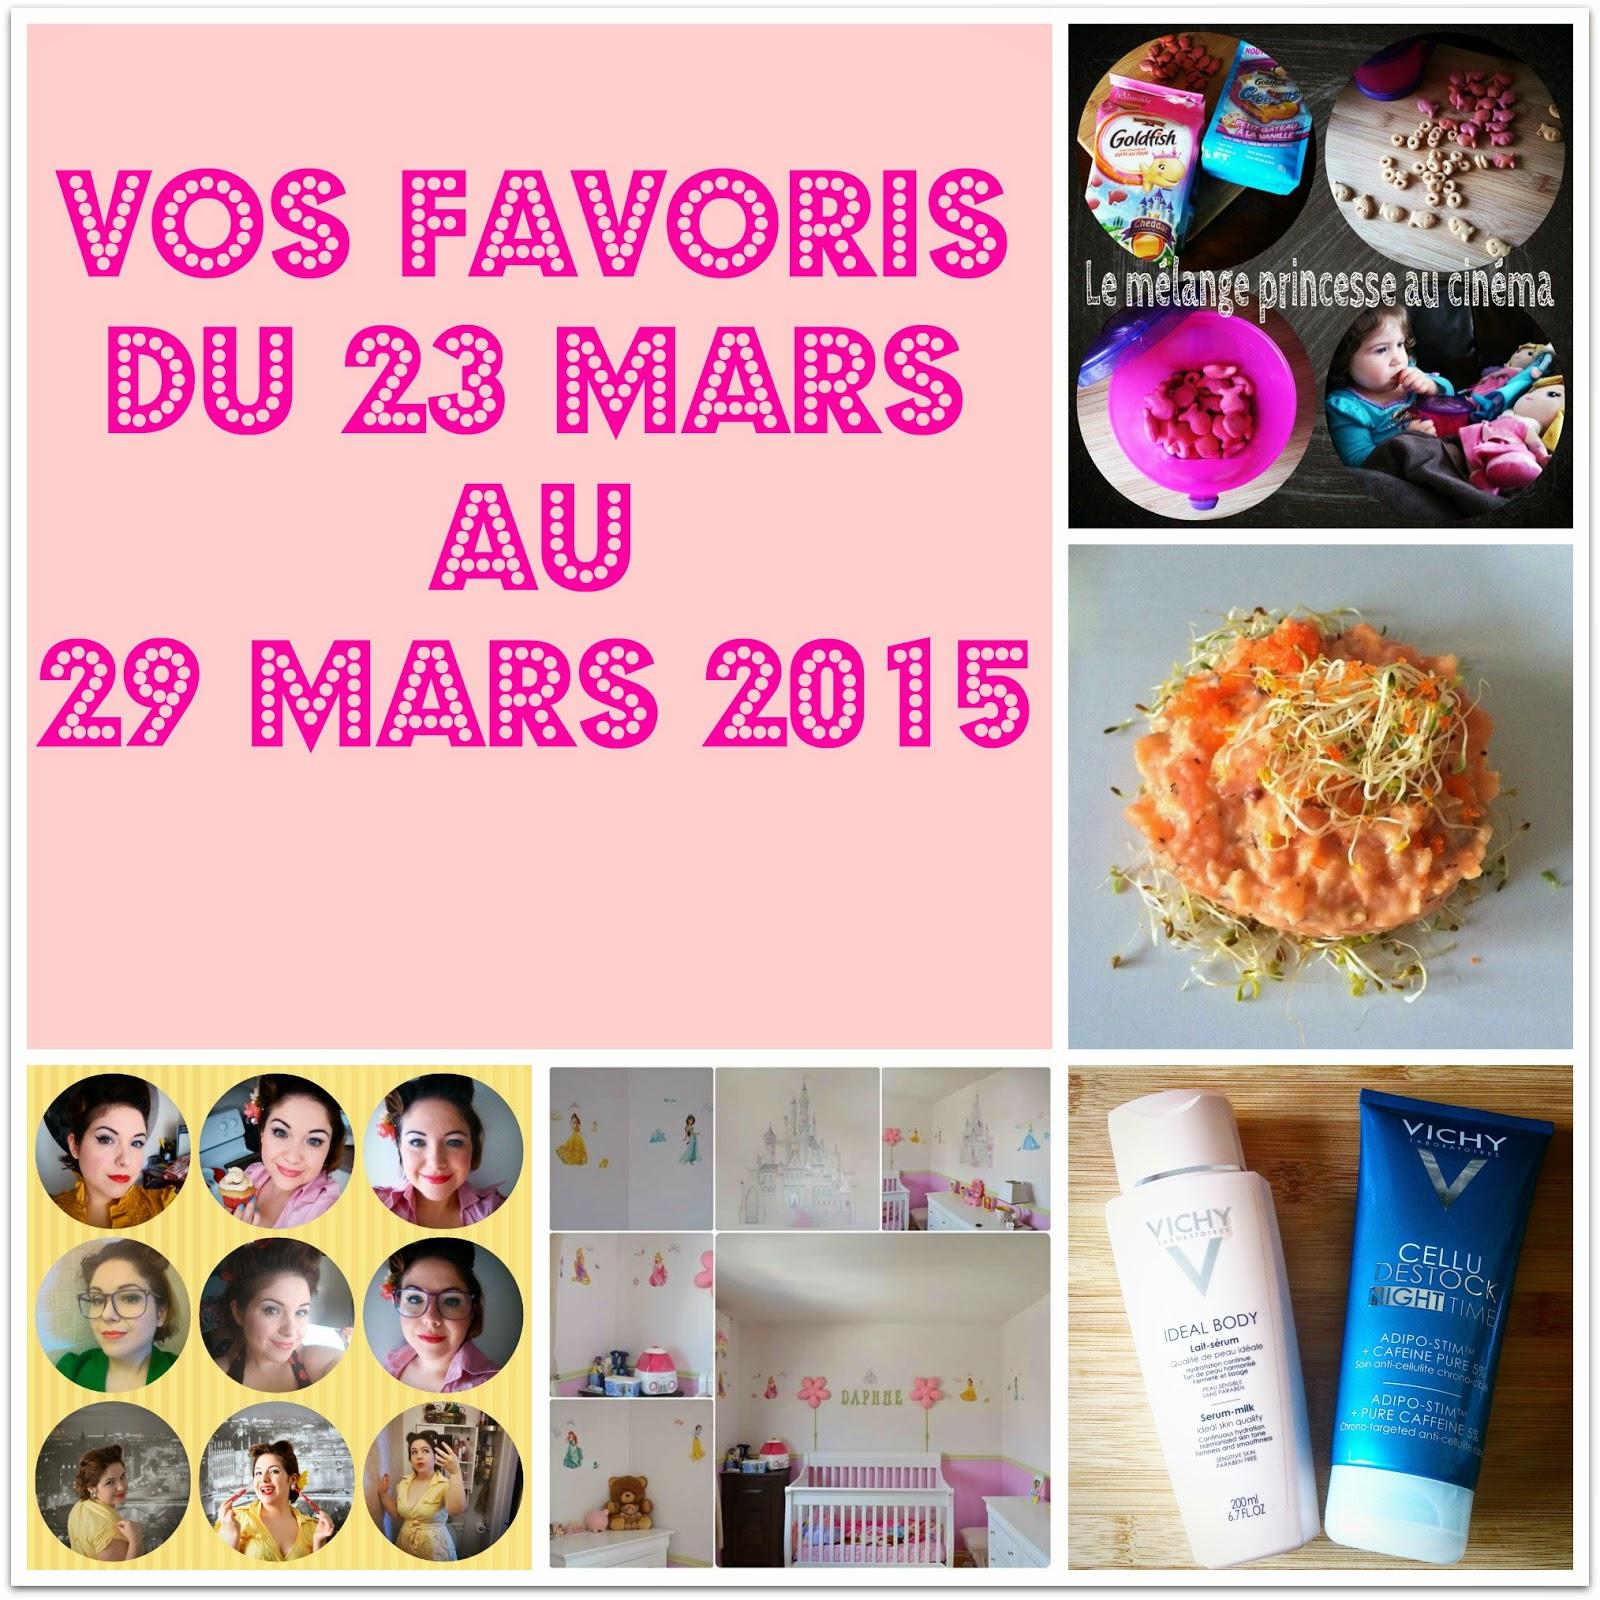 Vos favoris du 23 mars au 29 mars 2015...Rose! Oui Rose!